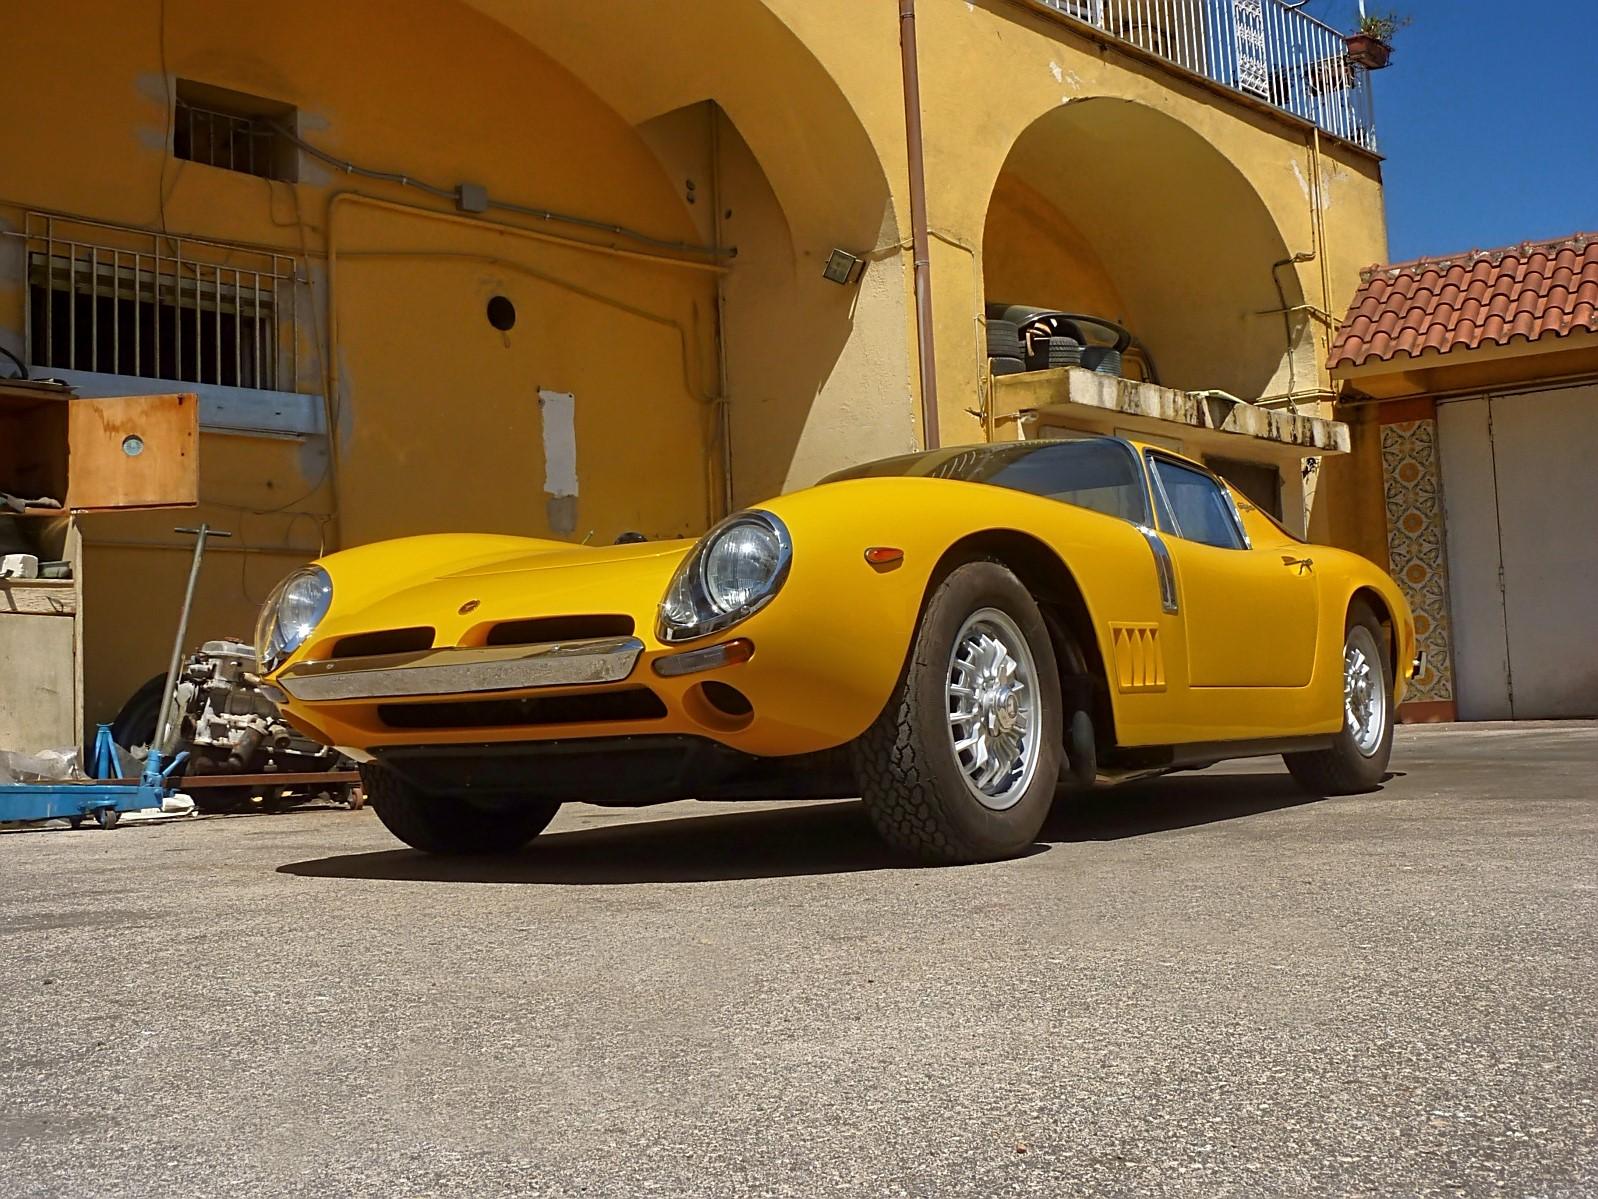 1966 Bizzarrini 5300 GT Strada (72).jpg